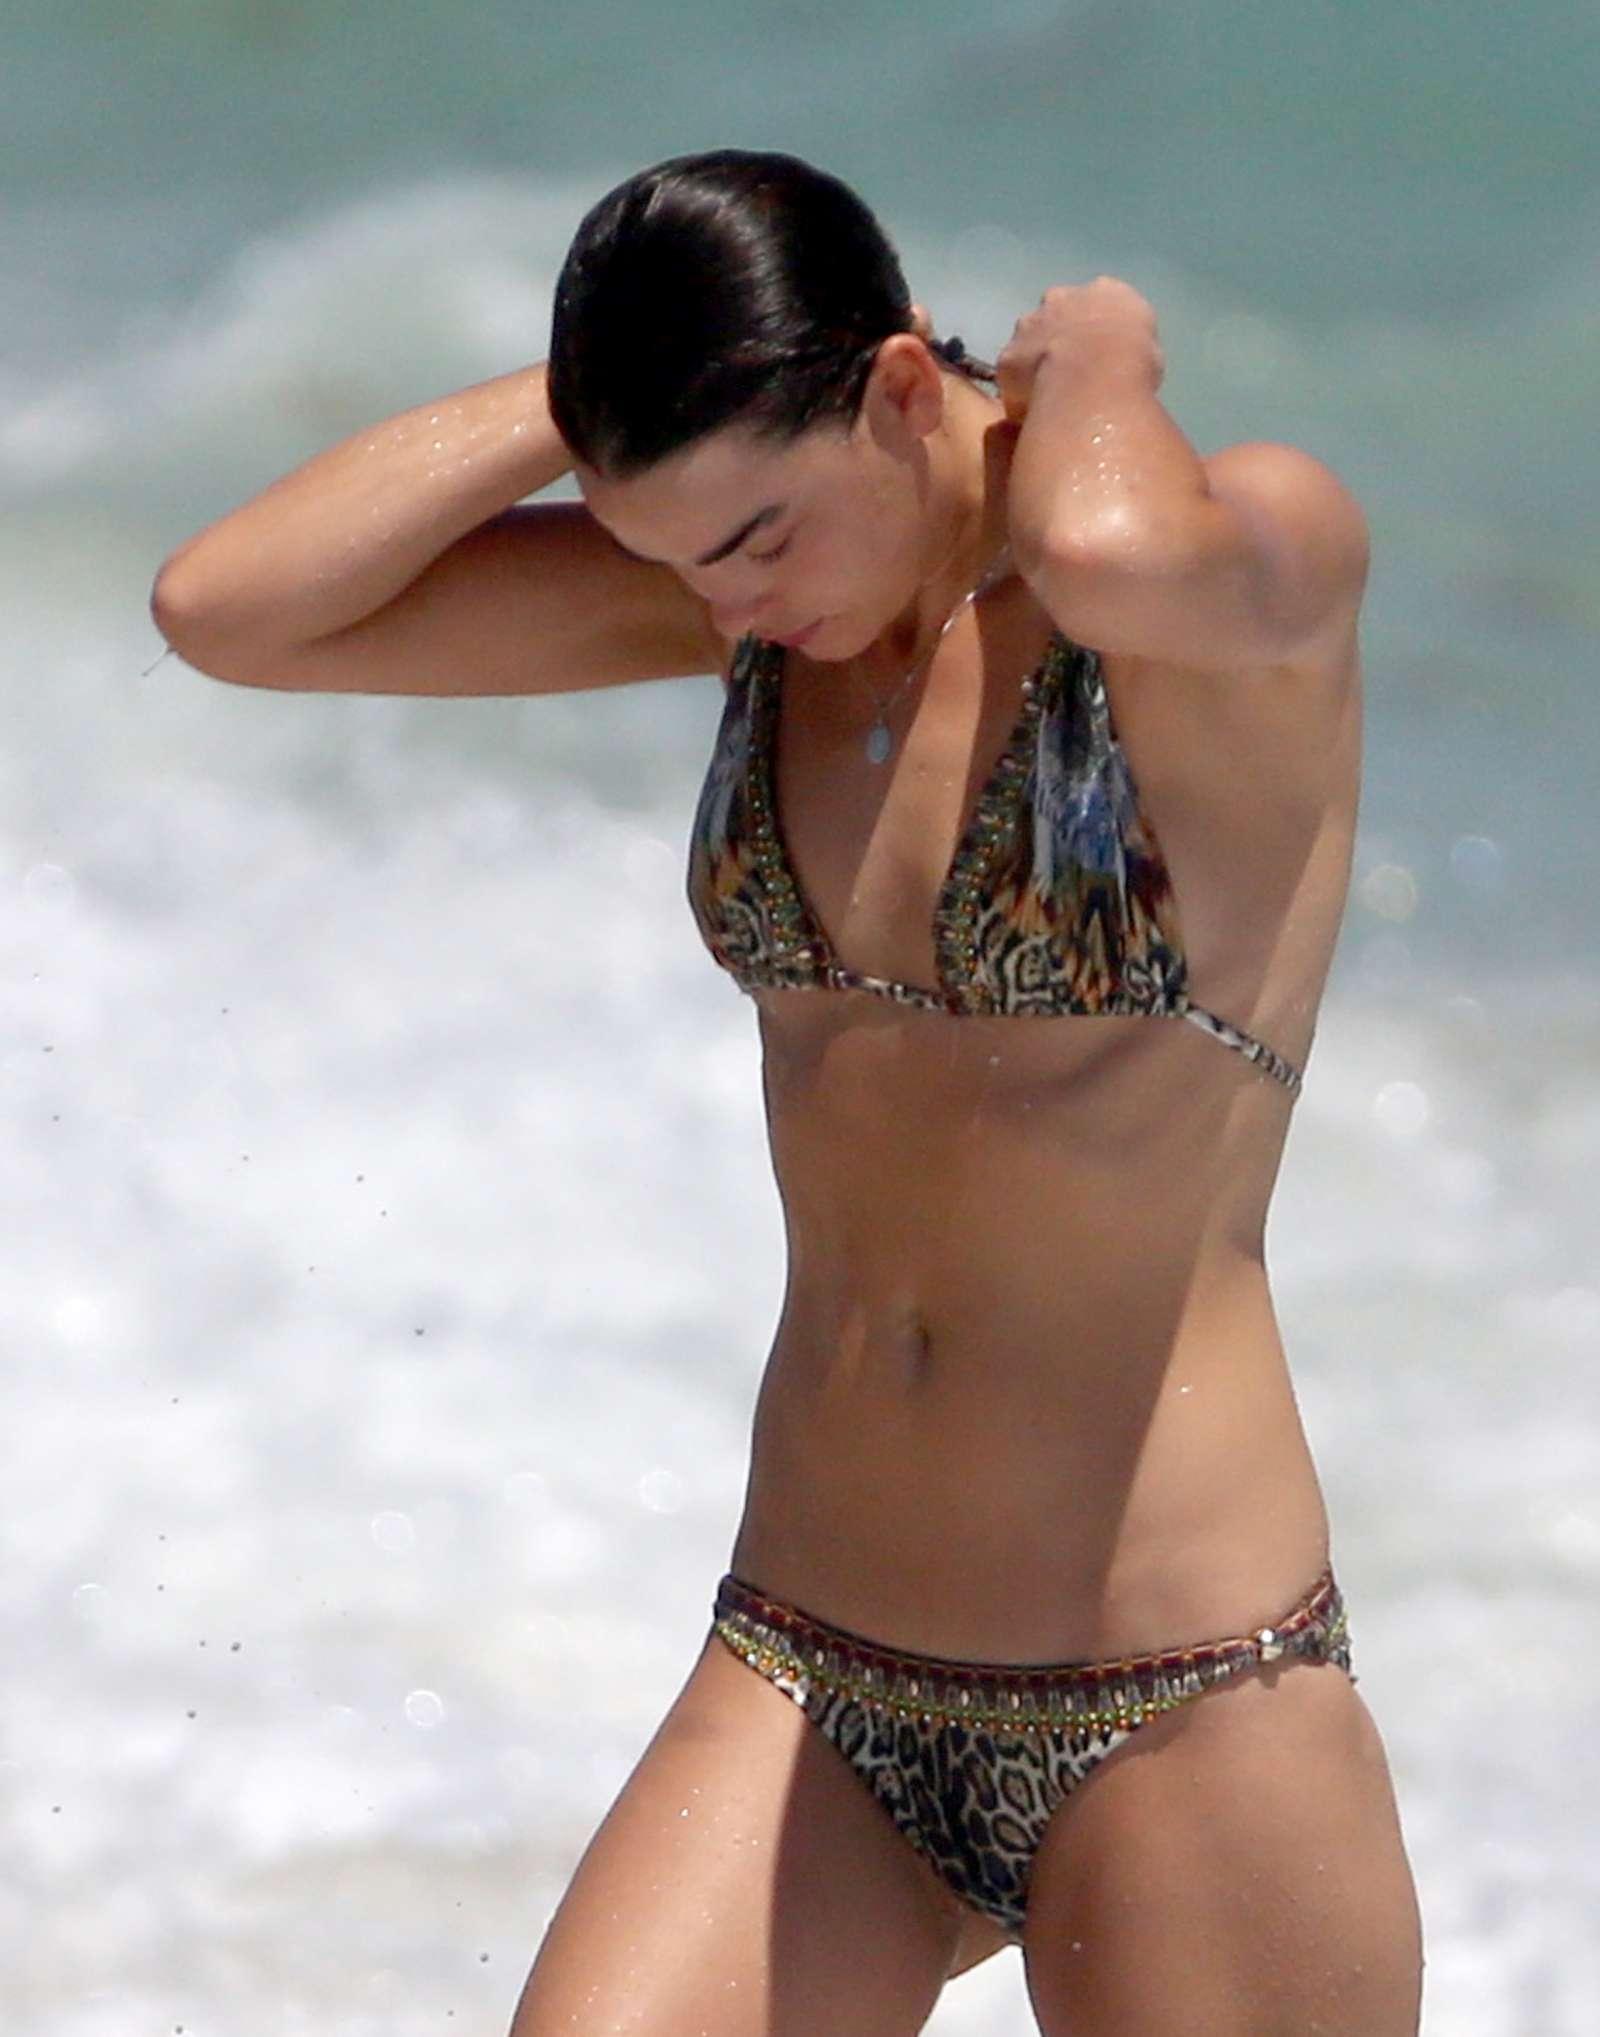 Bambi Northwood Blyth in Bikini at Miami Beach